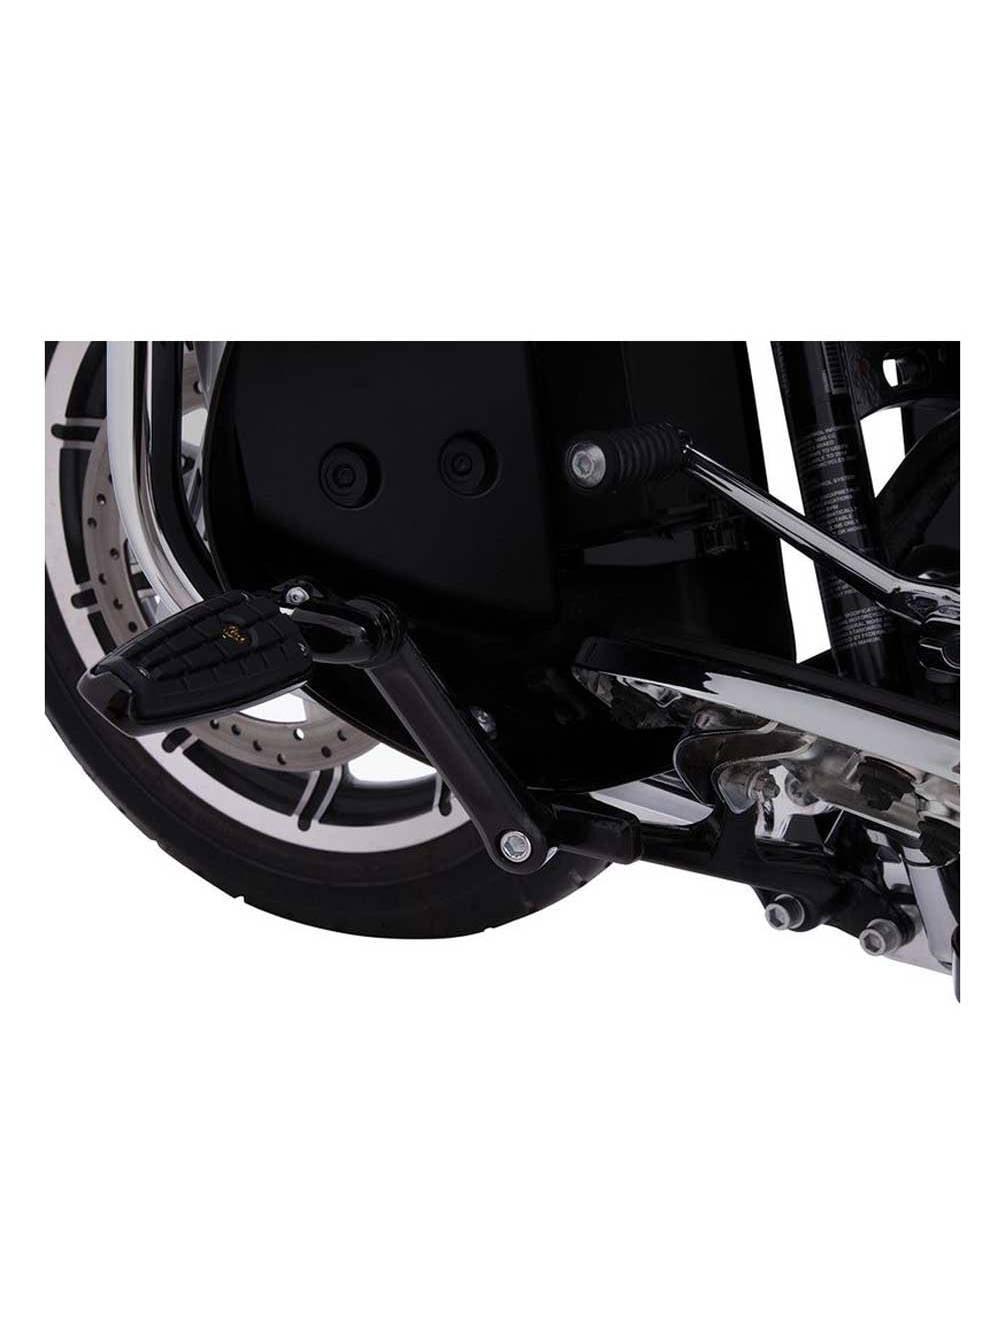 60120 CIRO Driver Floorboard Adjustable Highway Peg Mounts Black